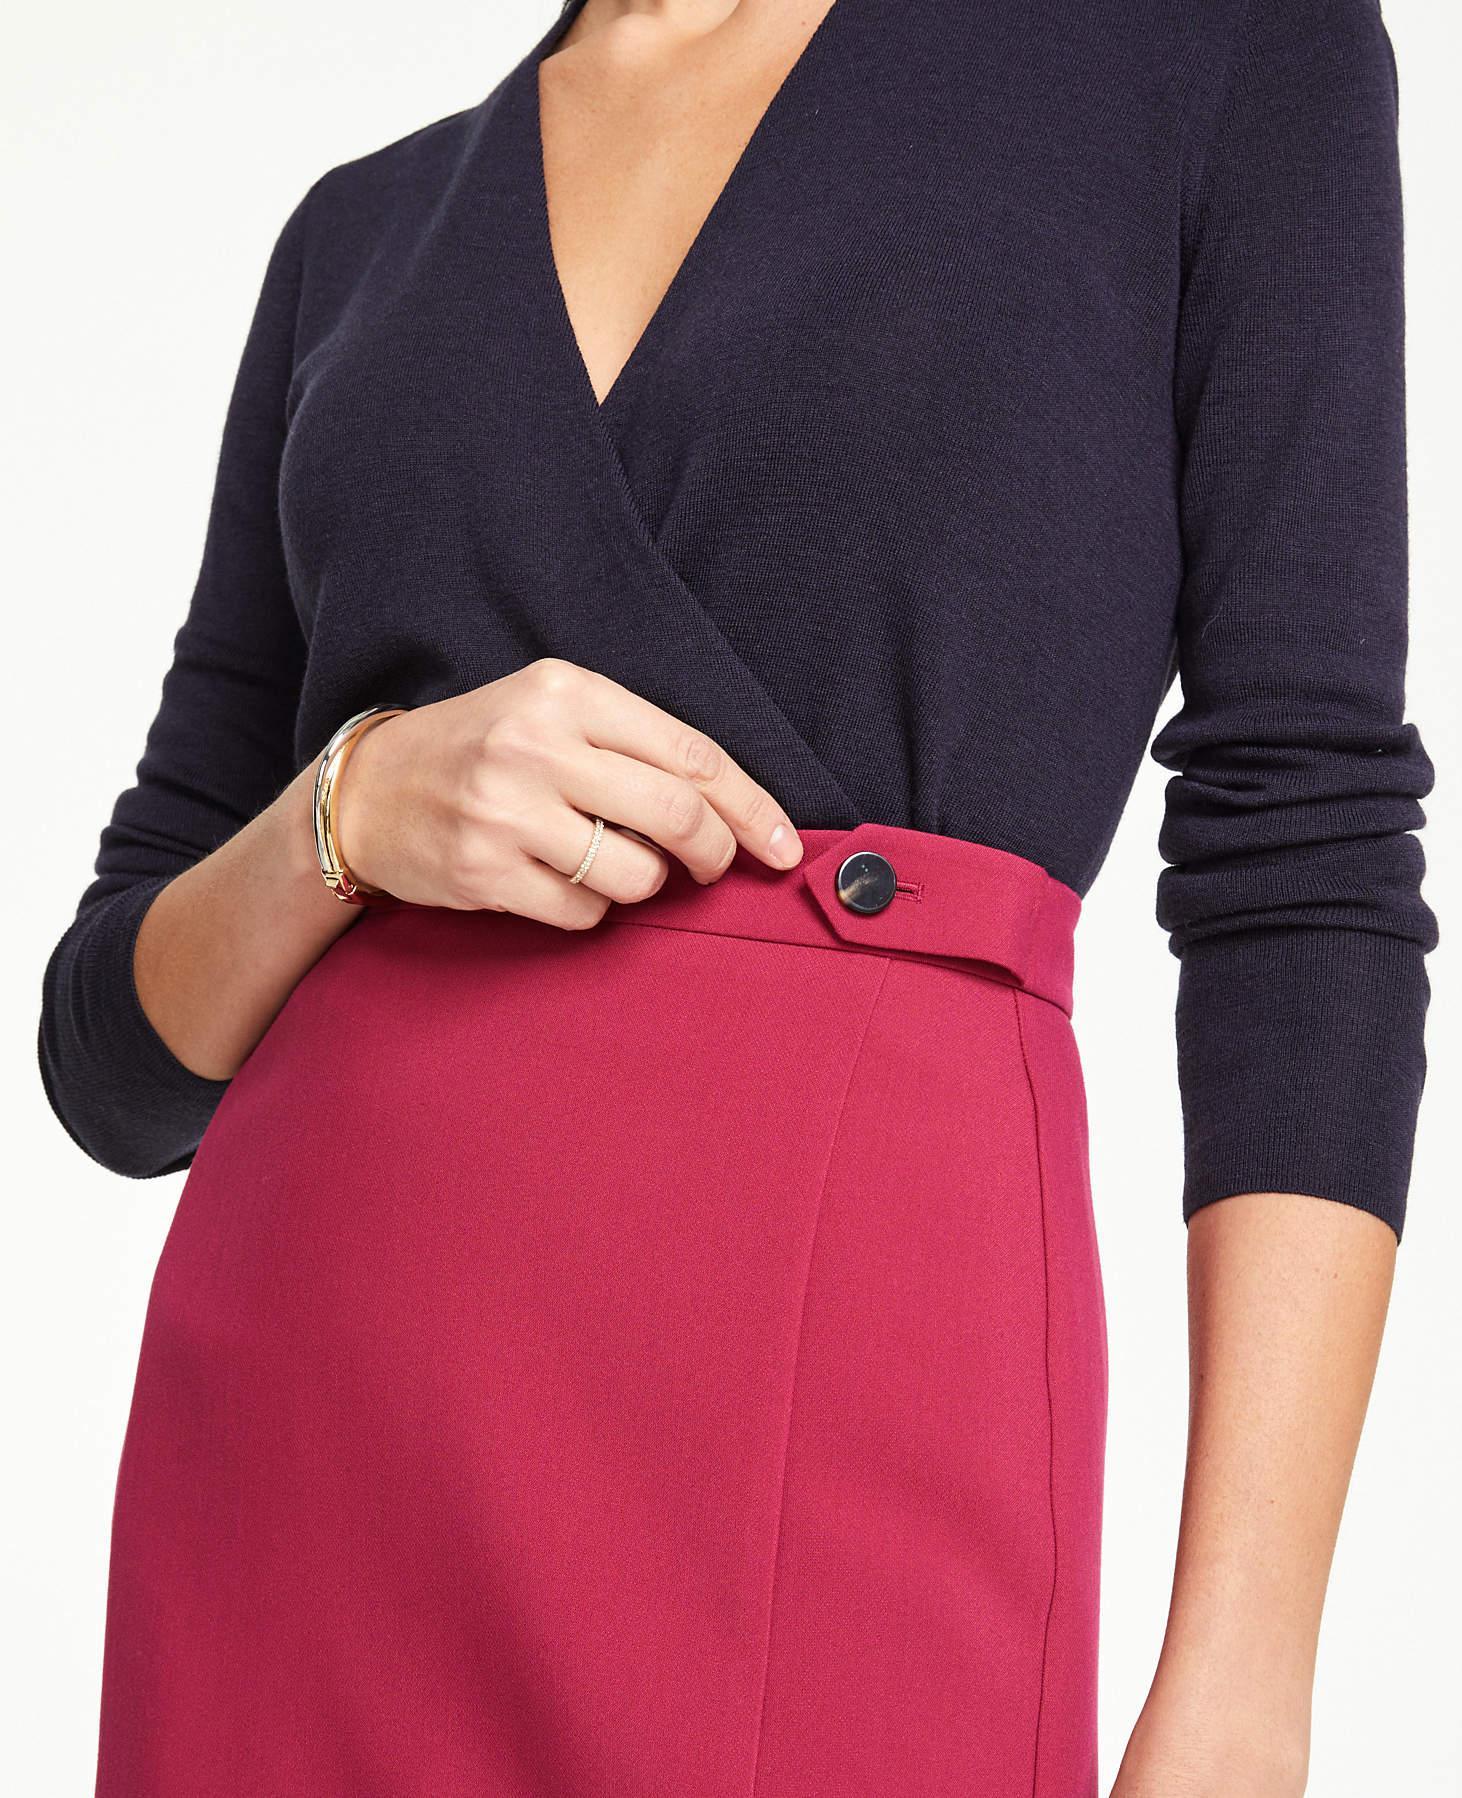 3cefb79b5d Ann Taylor Curvy Button Tab Seamed Pencil Skirt - Lyst